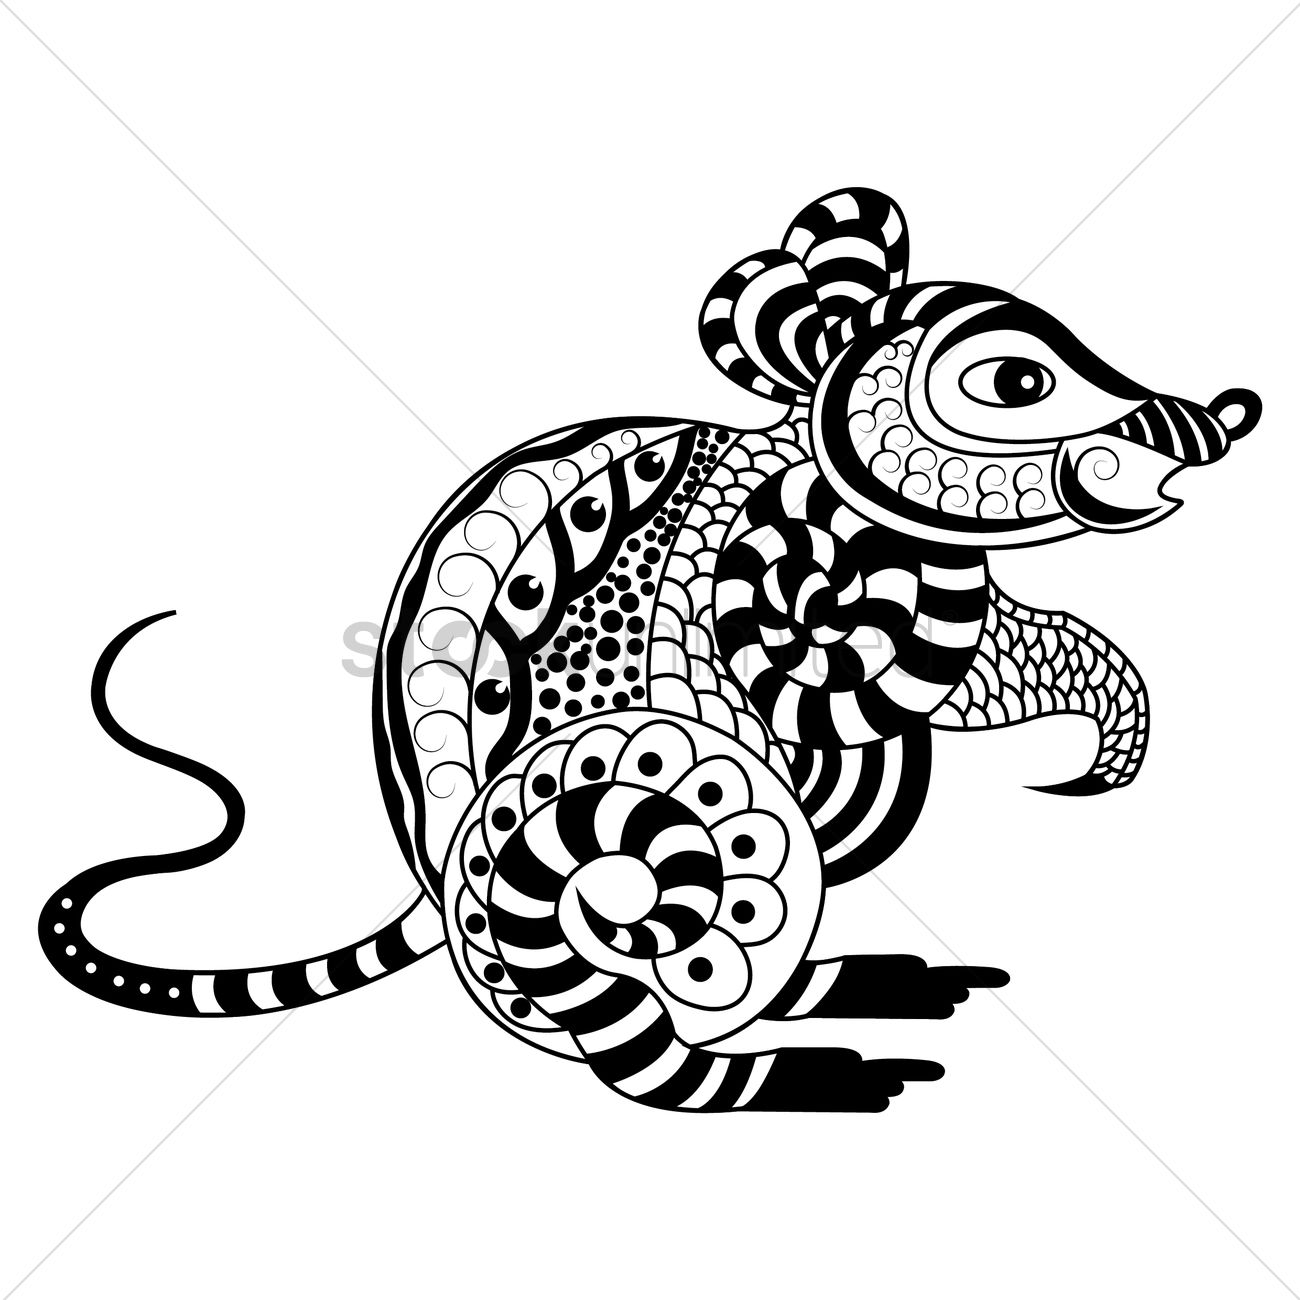 Decorative Rat Design Vector Image